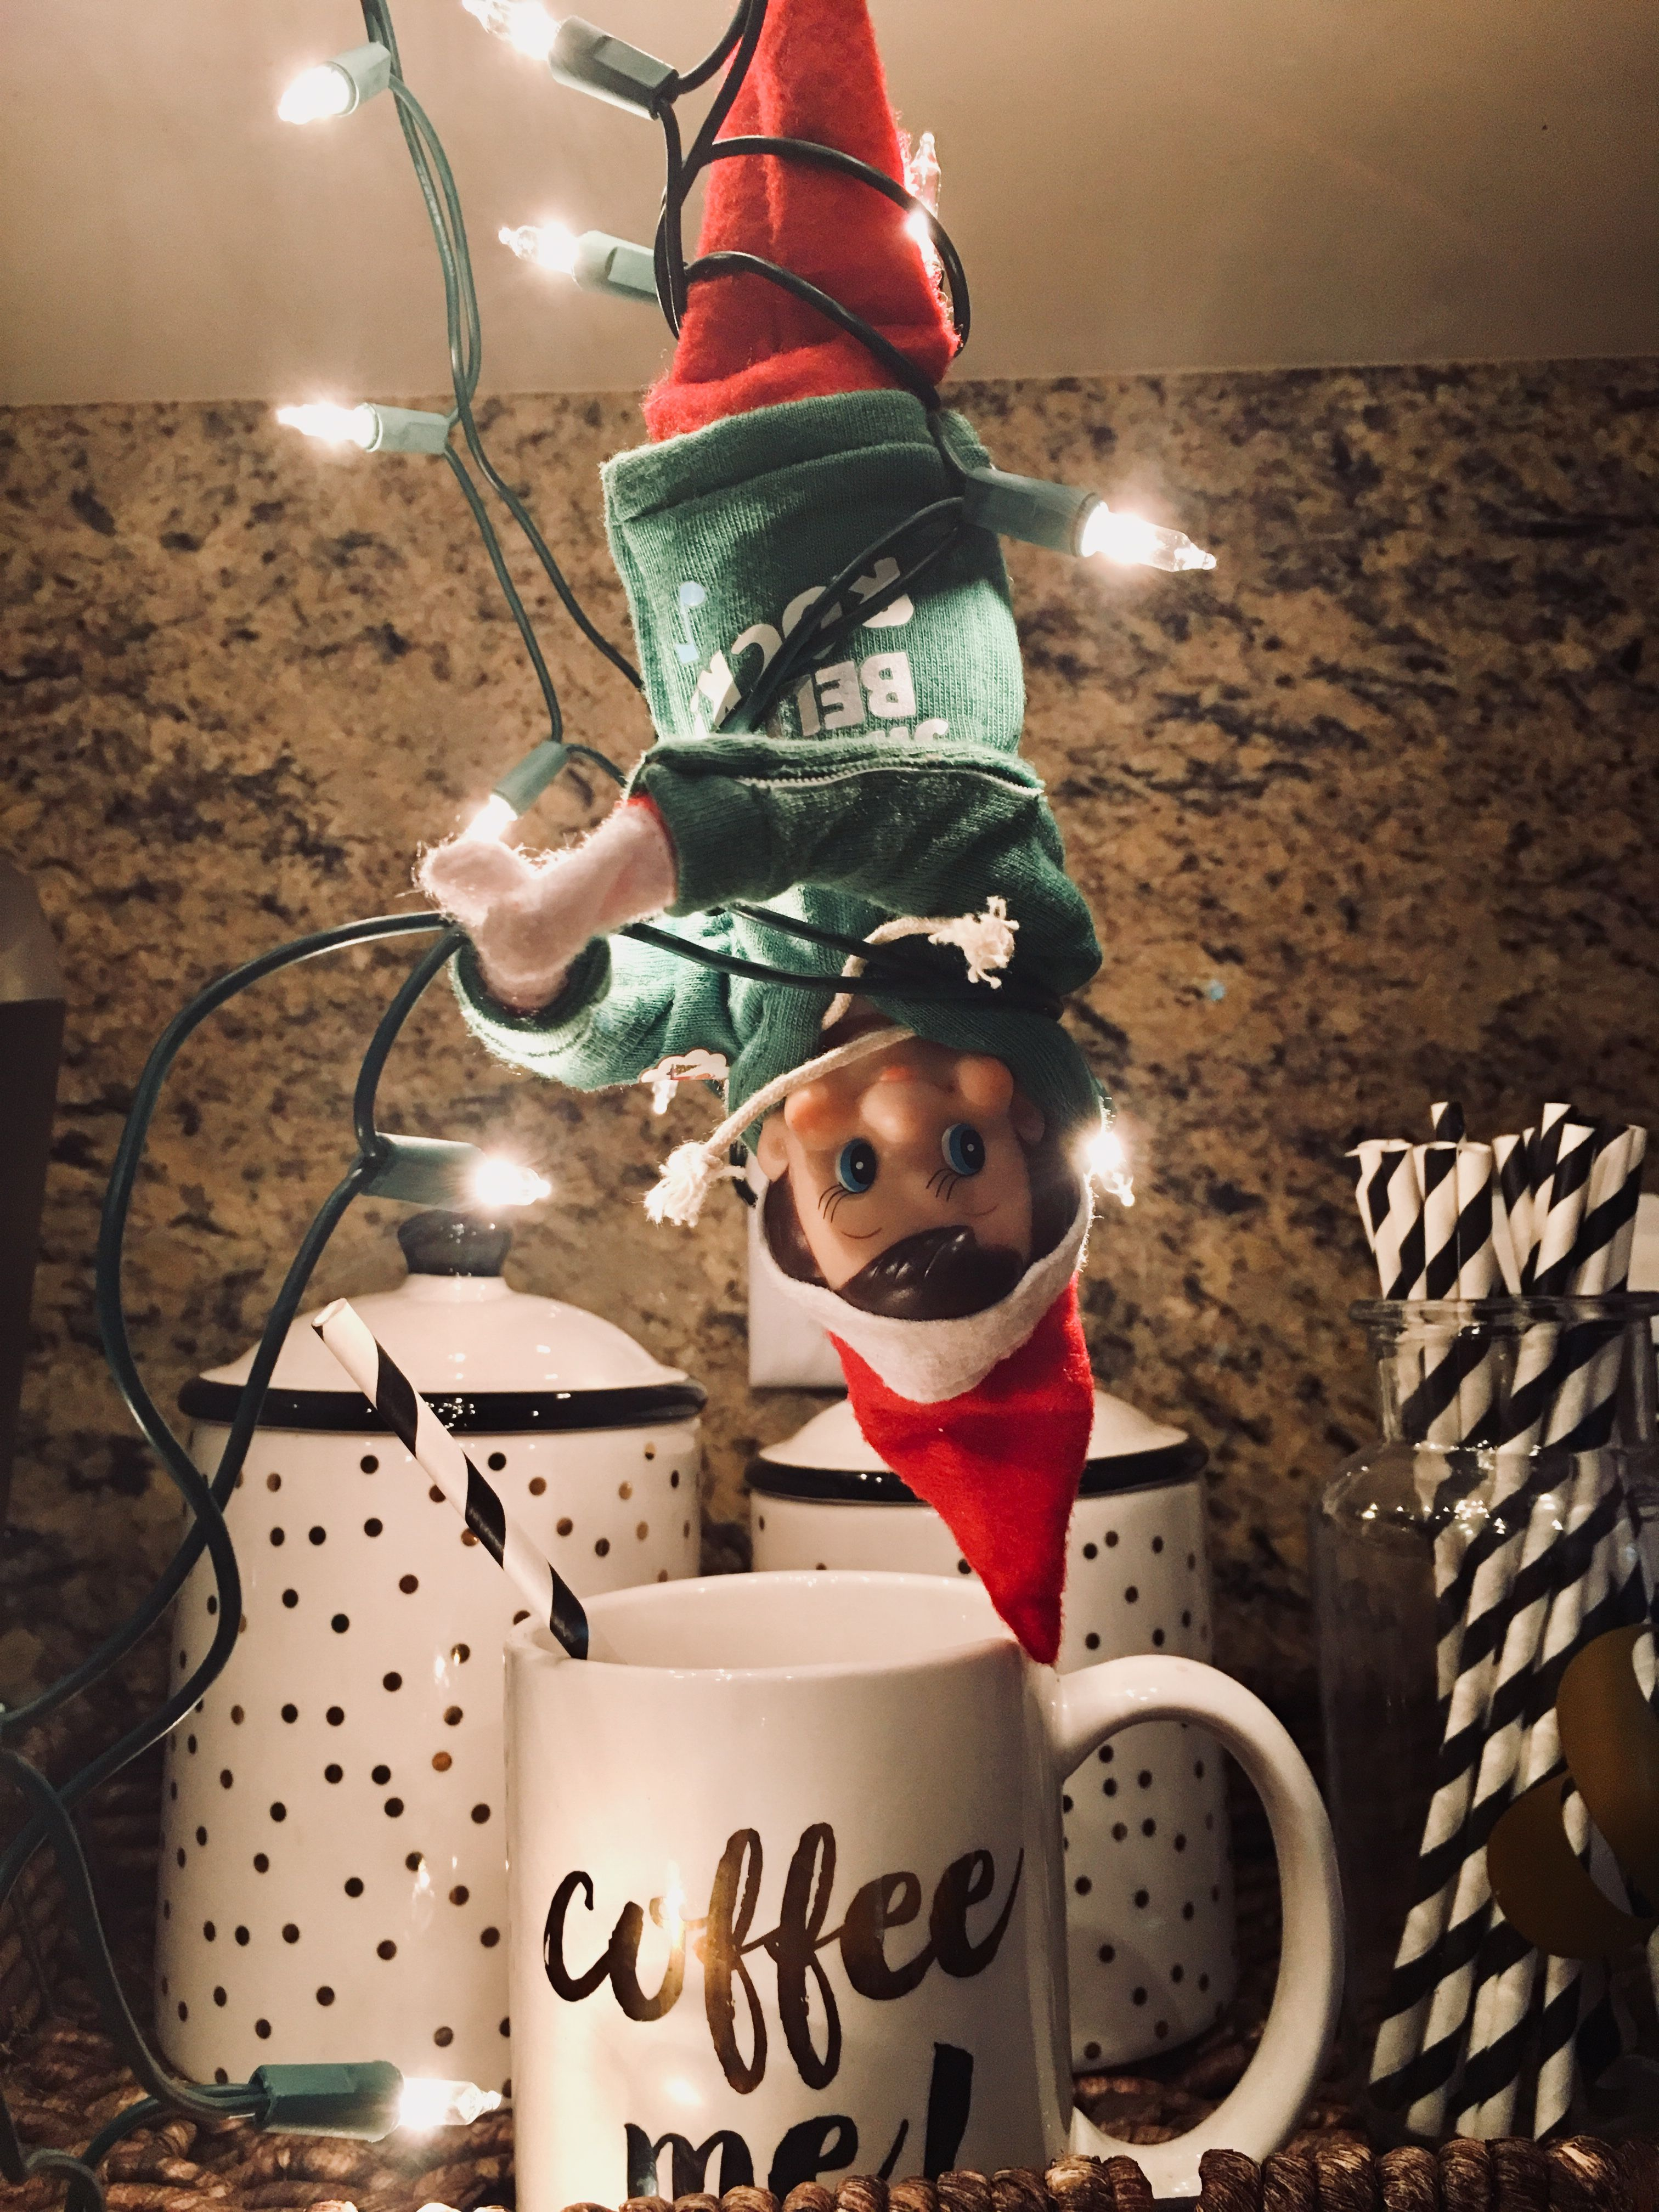 Coffeeor the elf gets it holiday decor elf the elf